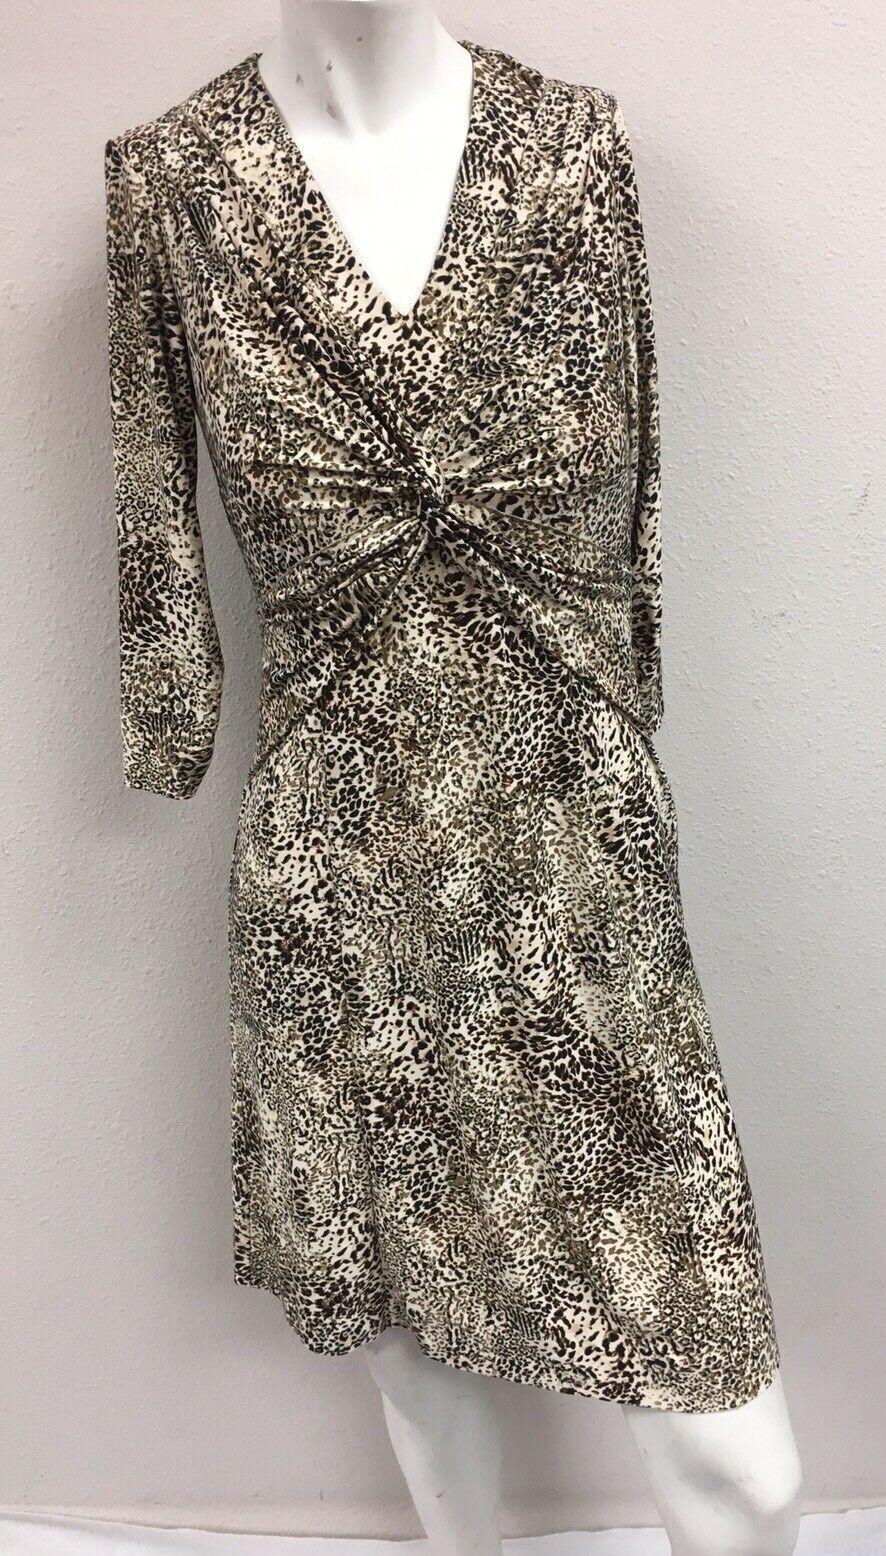 Leggiadro Woherren Leopard Animal Print 3 4 Sleeve Stretch V-Neck Dress Größe 4